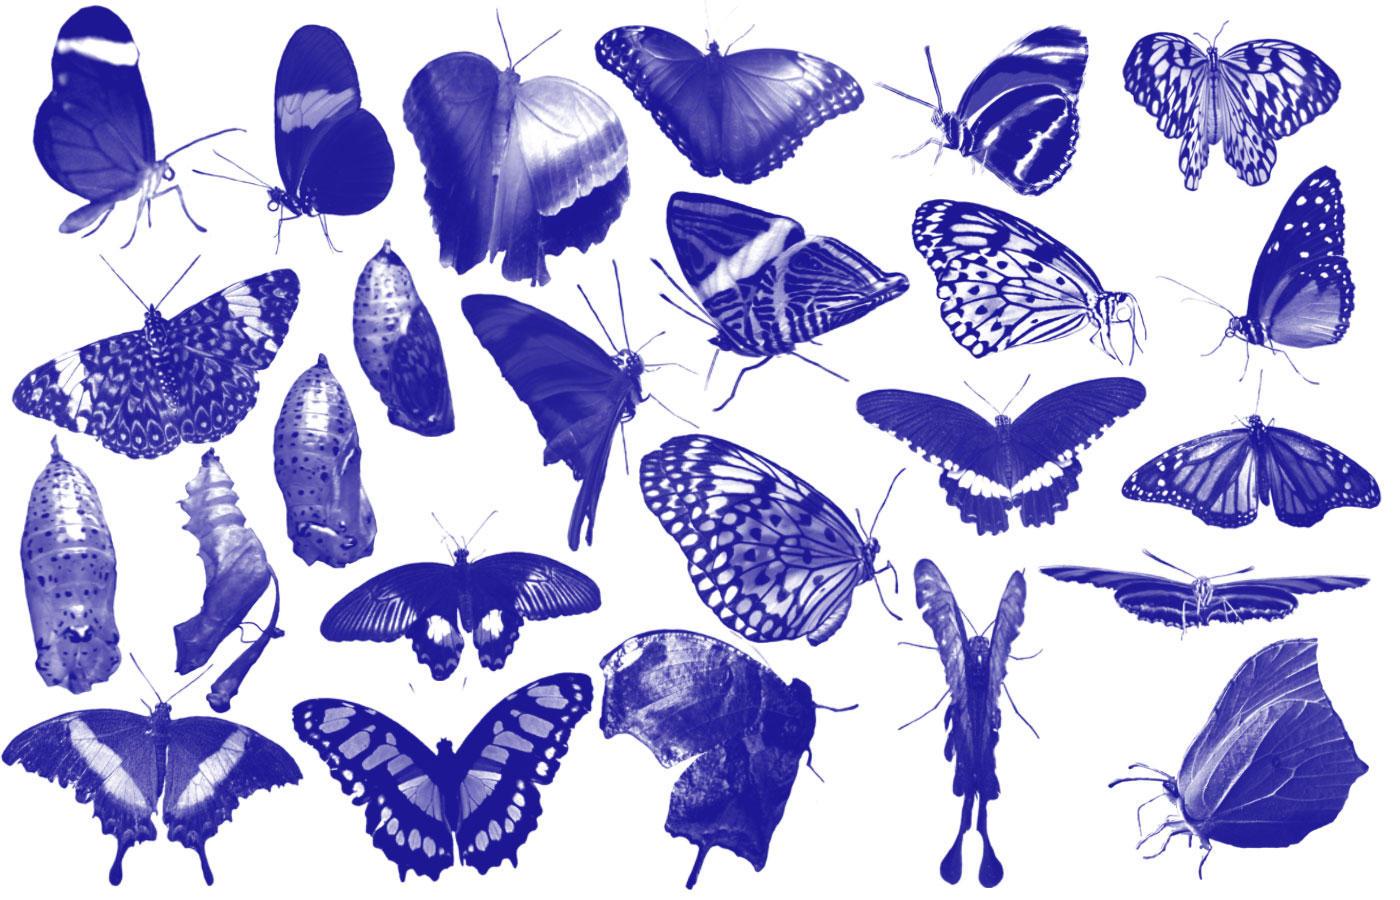 25 butterfly Photoshop brush by aswad-hajja